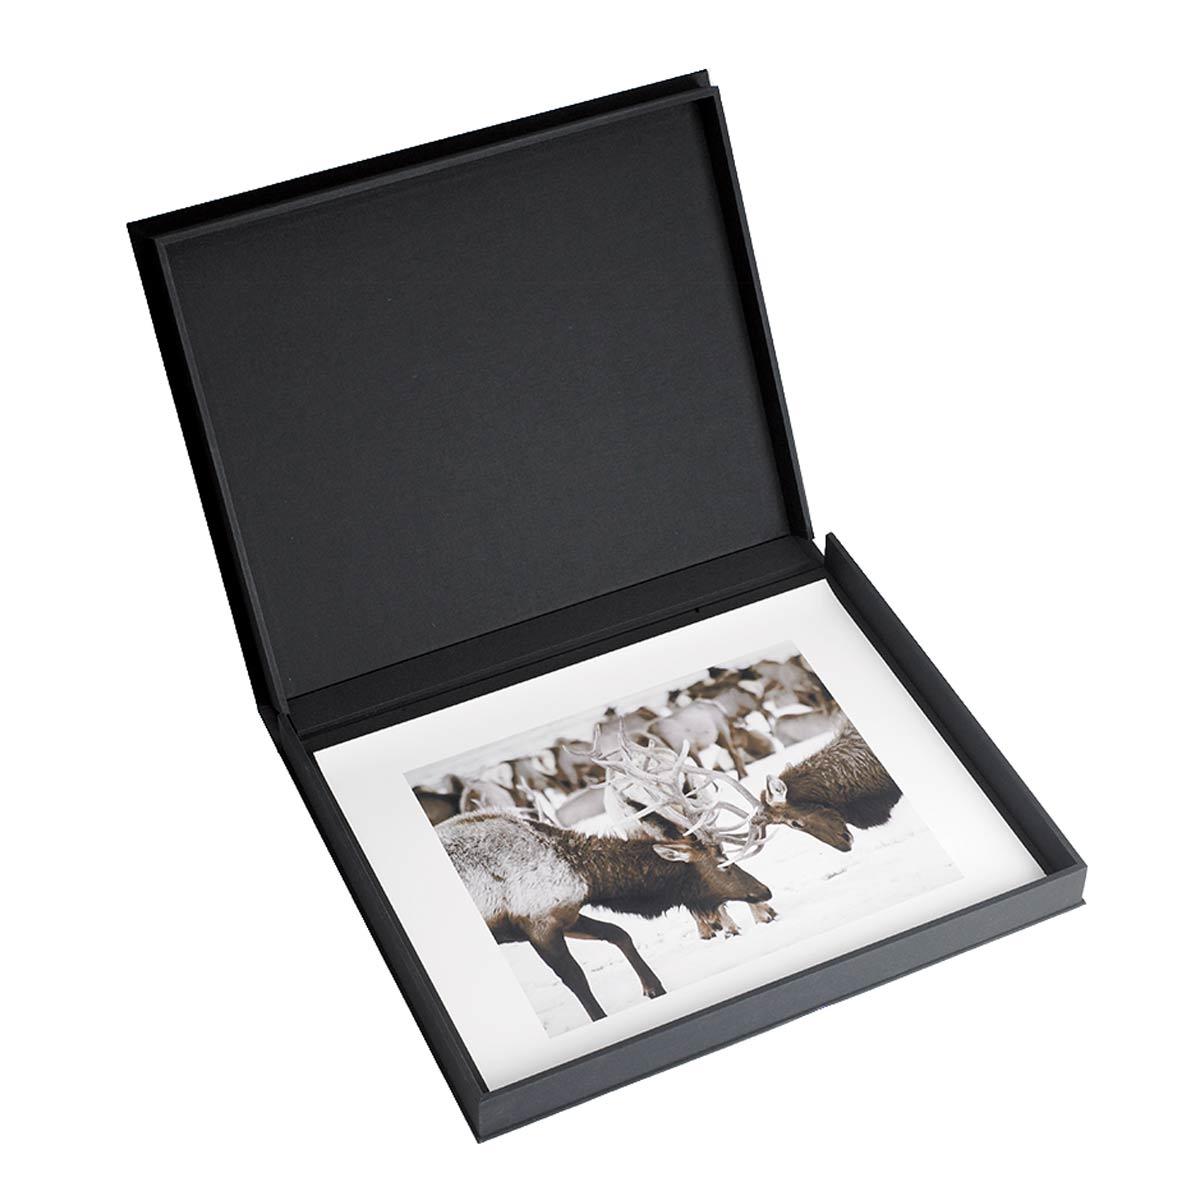 New Lipped Clamshell Luxury Presentation Portfolio Box | TALAS XT06